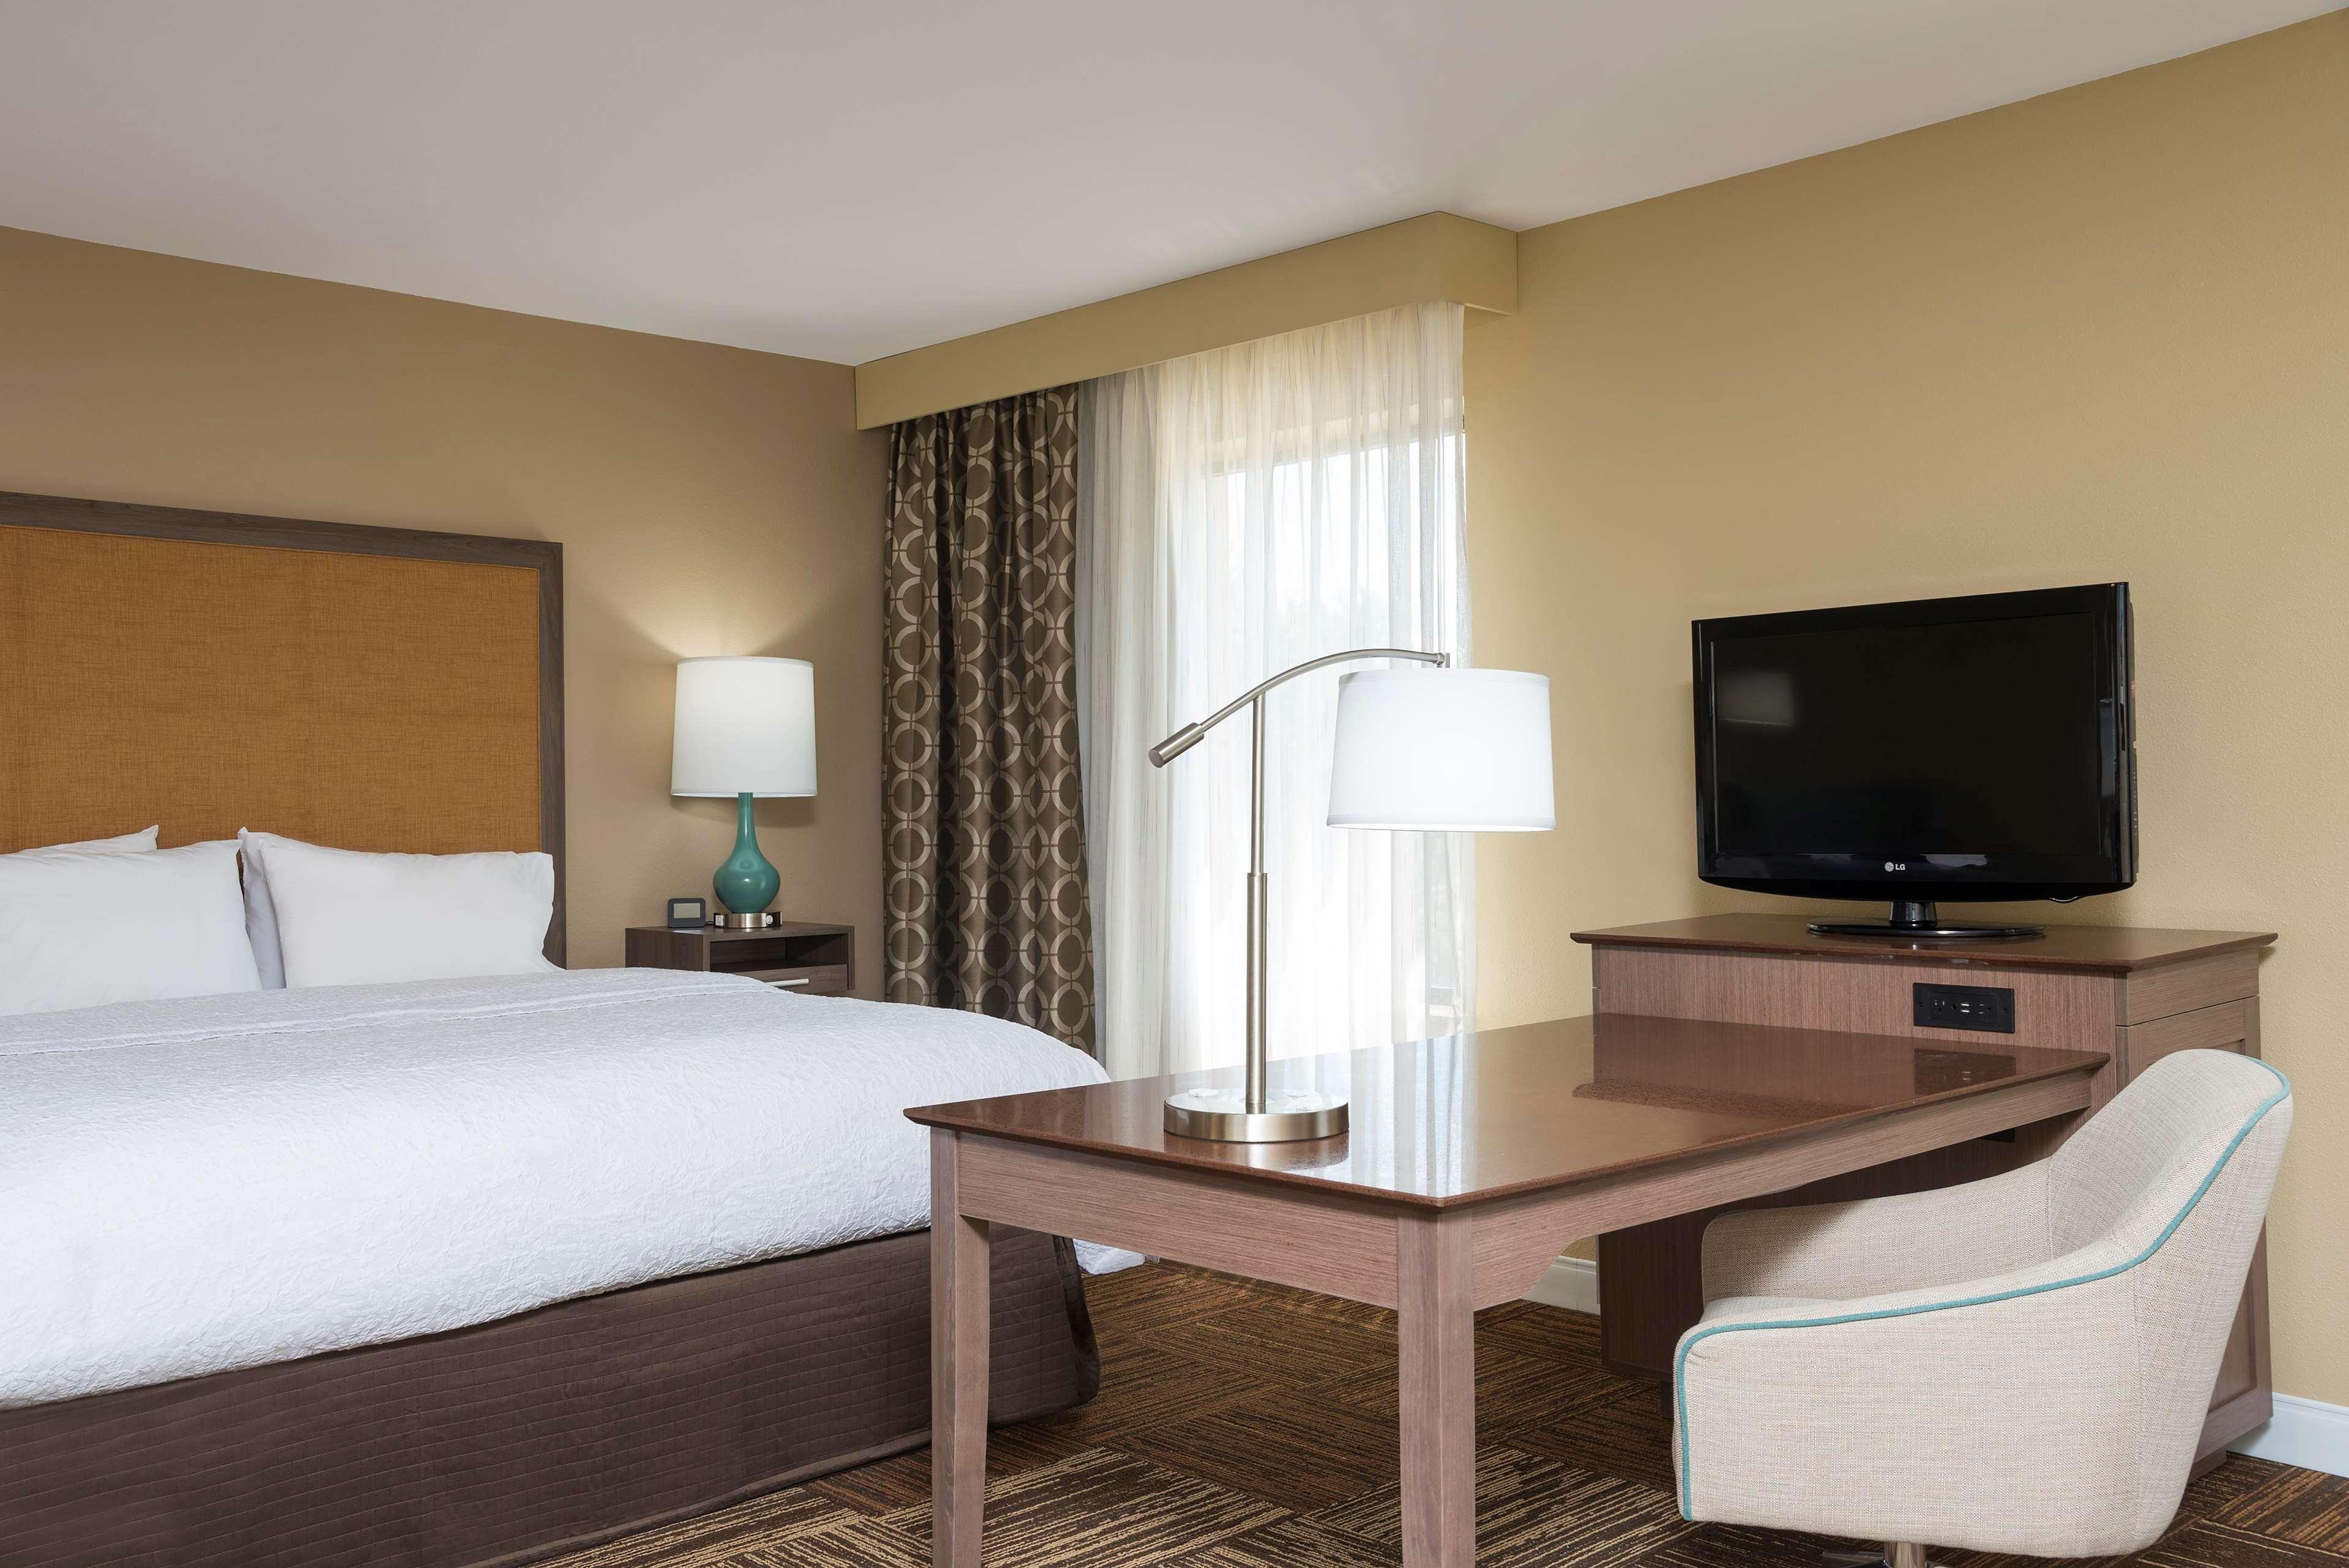 Hampton Inn & Suites Mansfield-South @ I-71 image 21